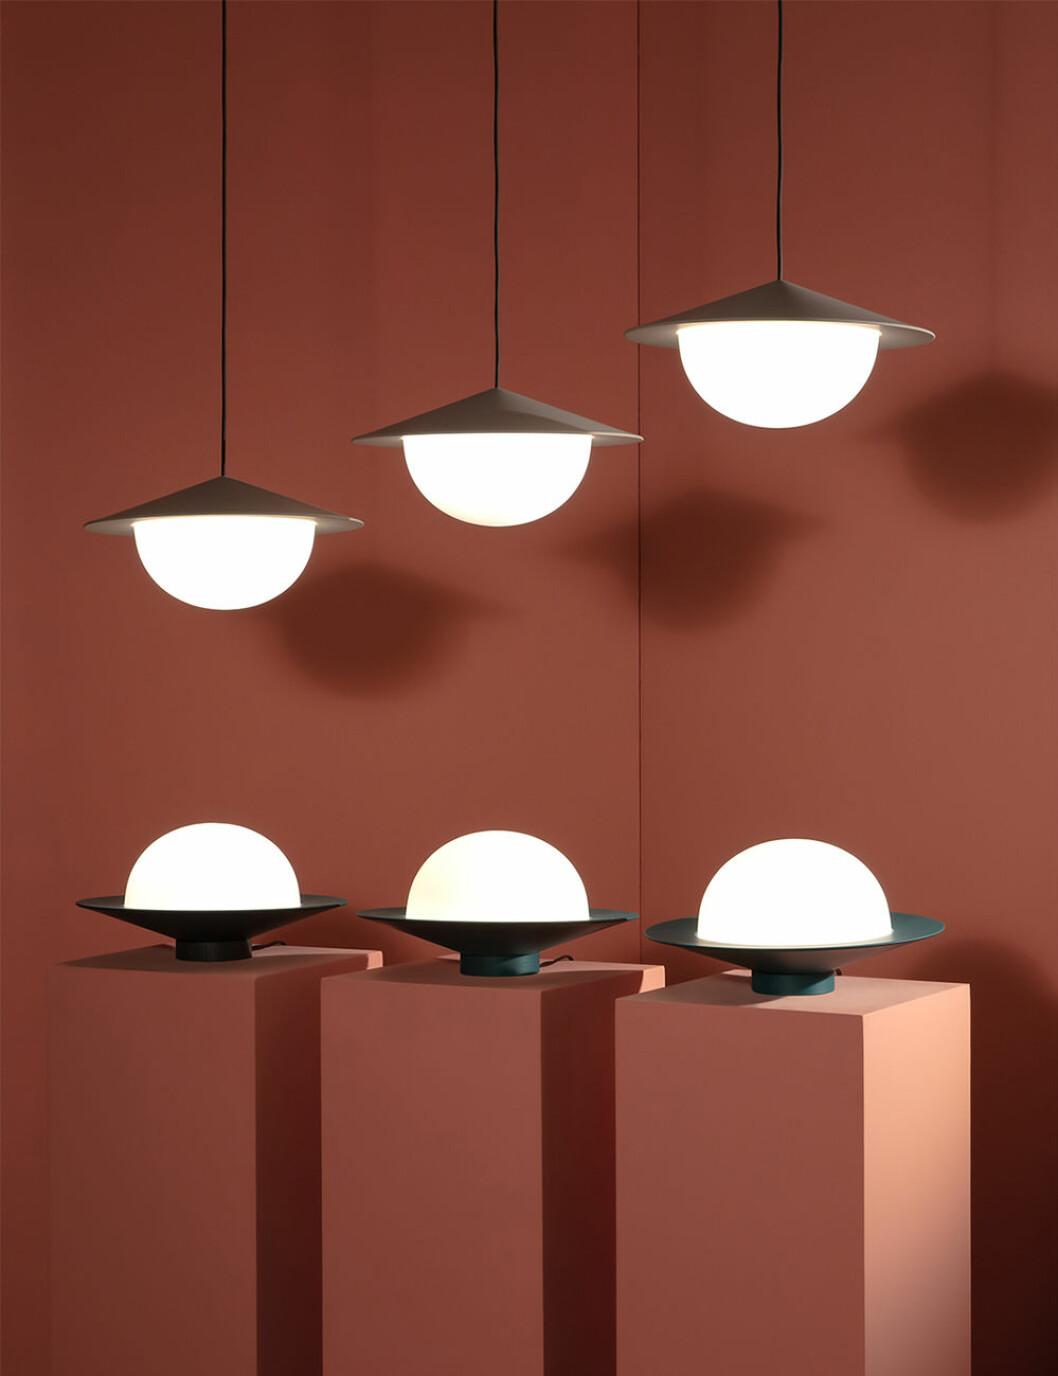 Lampor från Ago